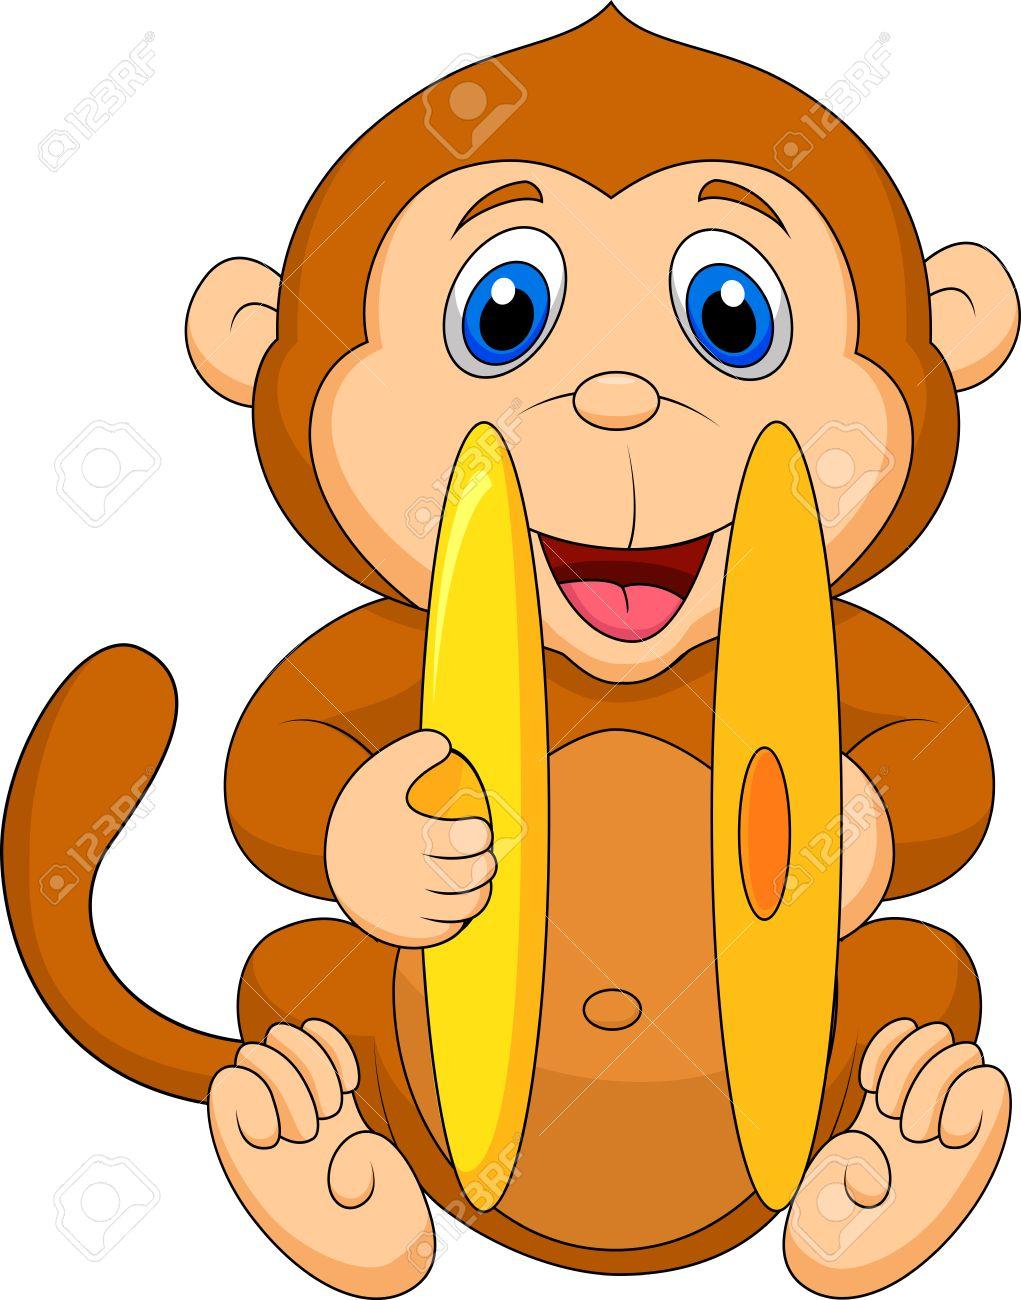 Cute Monkey Cartoon Playing Cymbal Royalty Free Cliparts, Vectors.